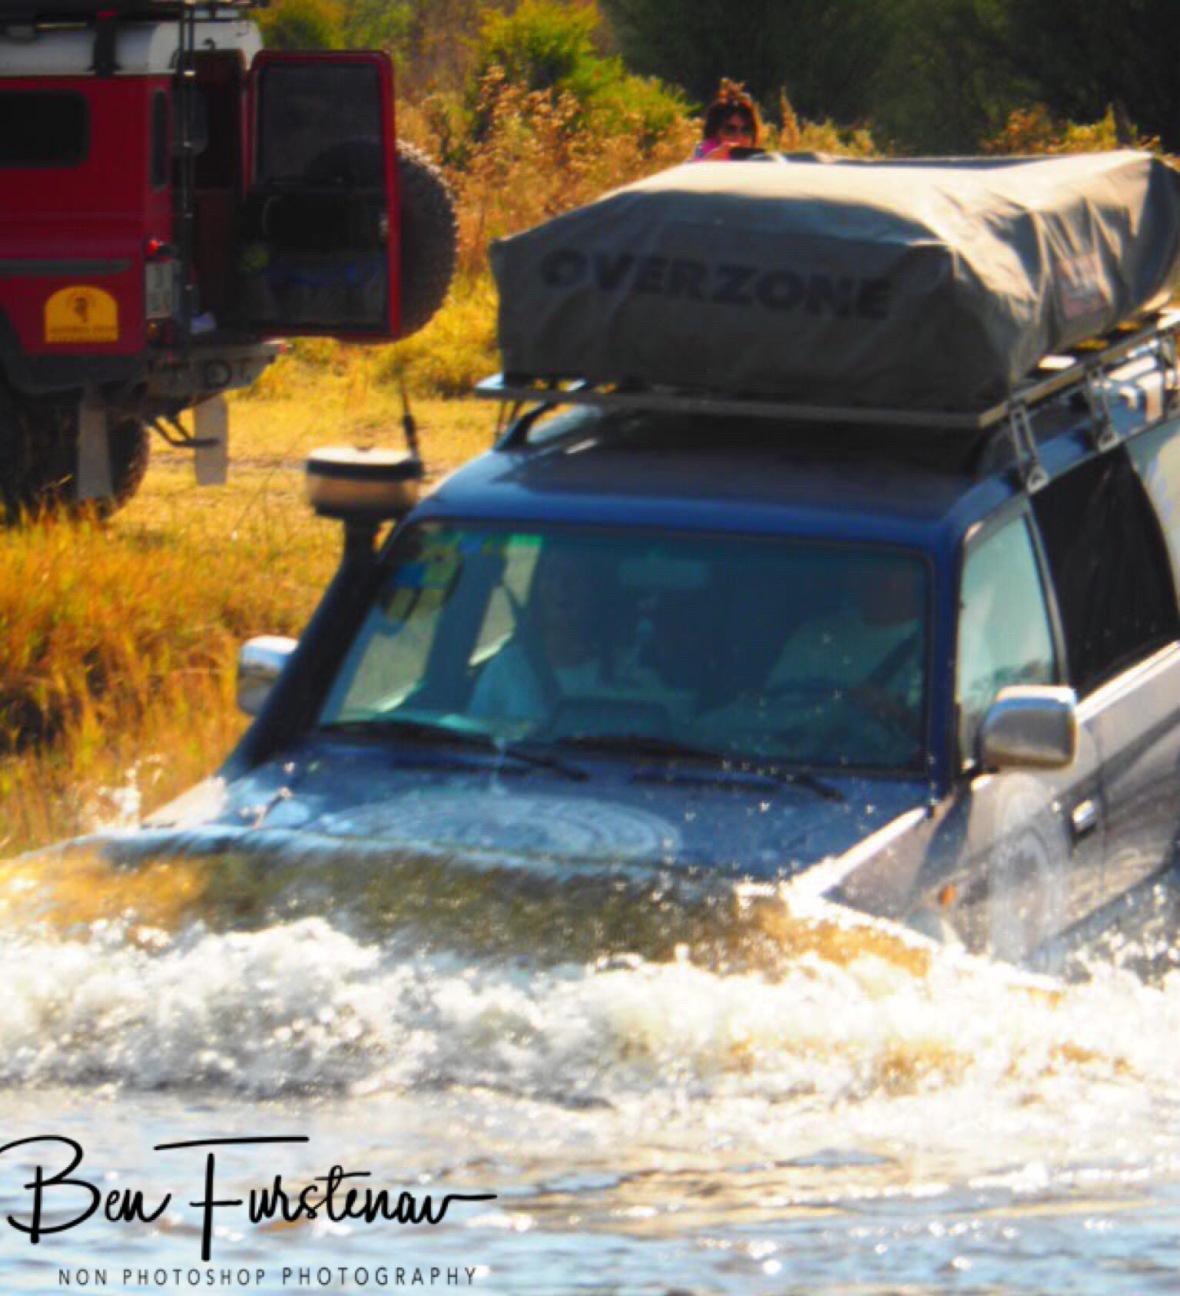 Oops, left the window open, Kwai Region, Okavango Delta, Botswana